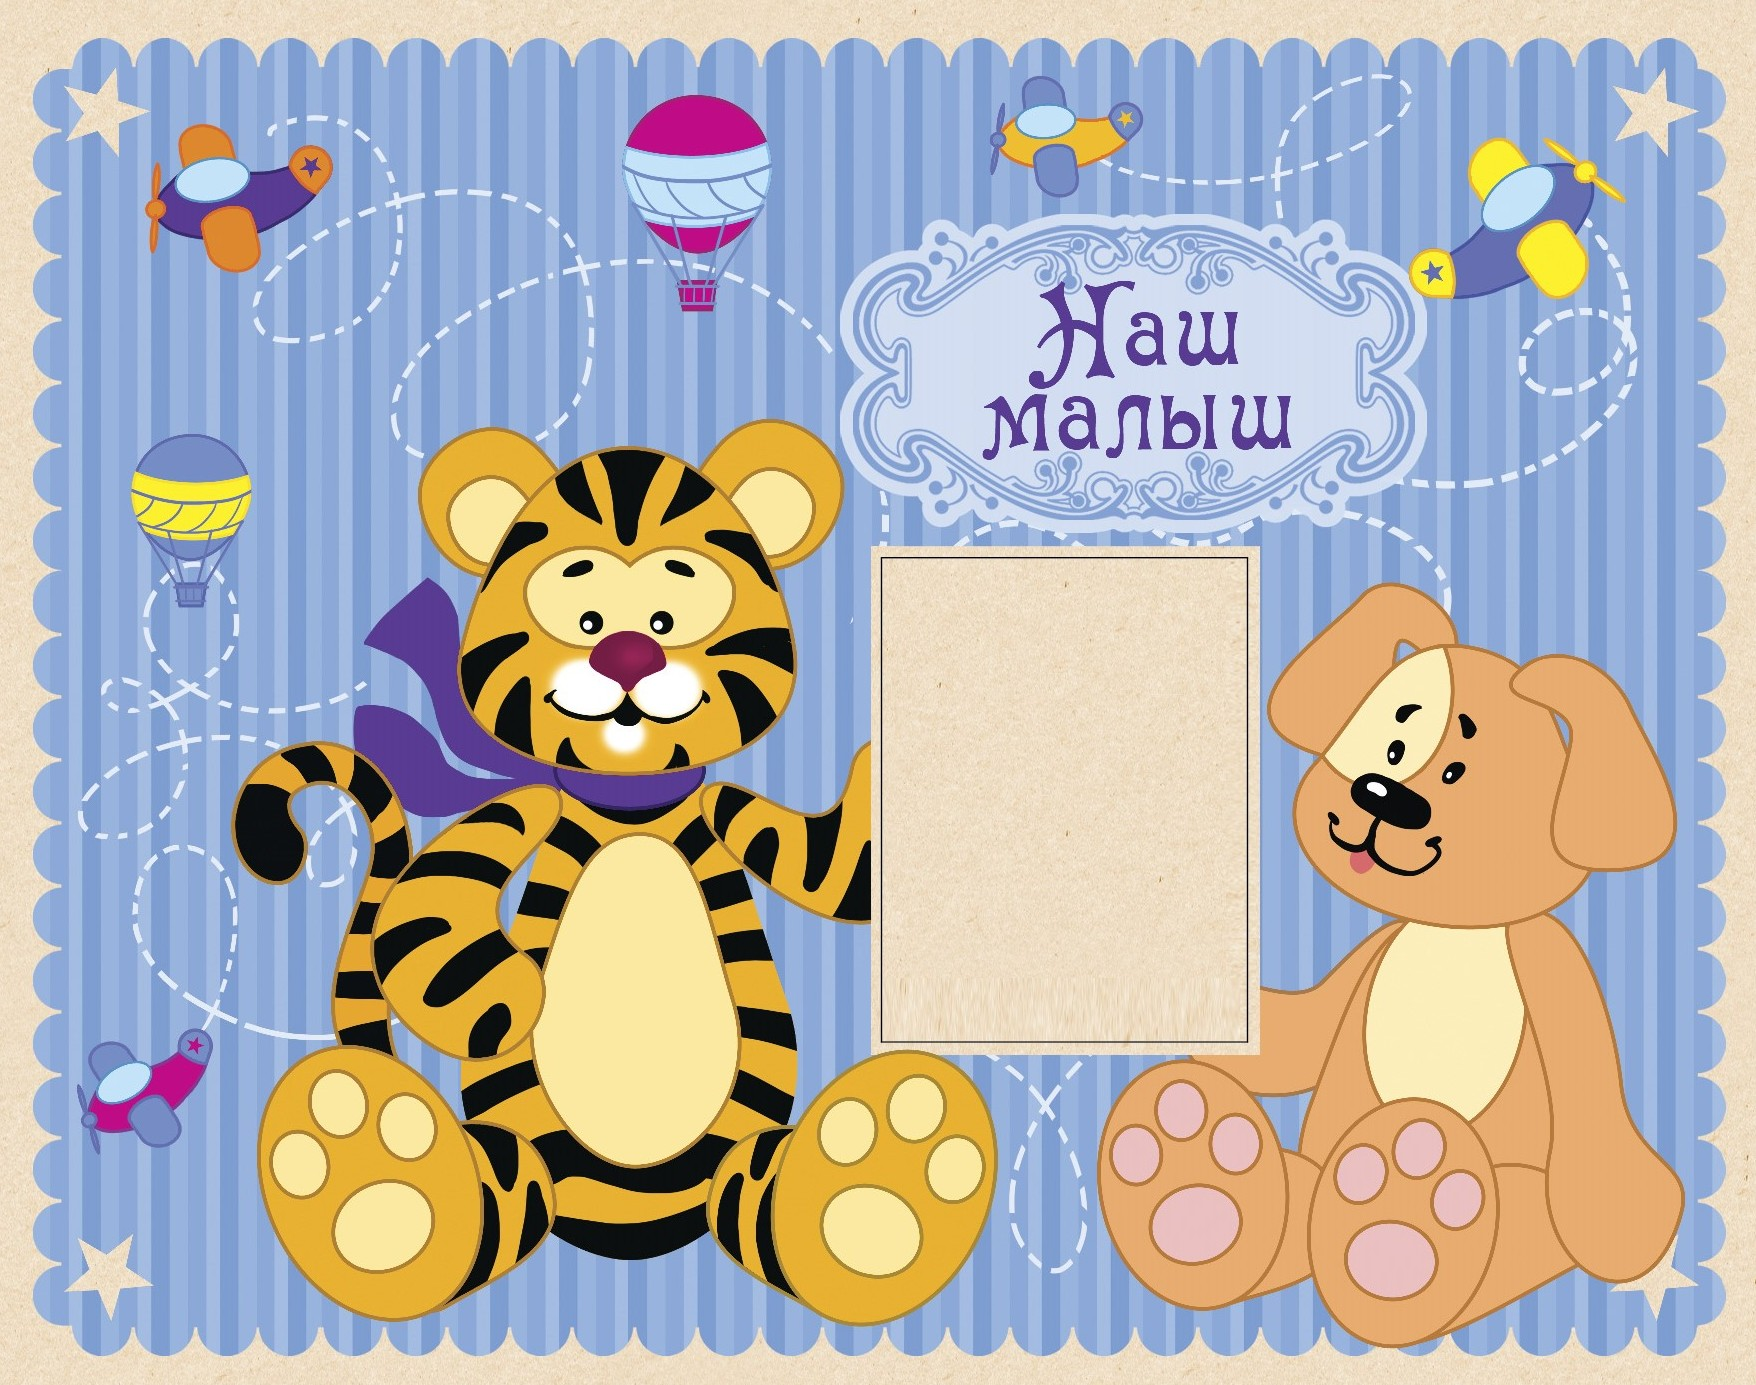 Картинки на обложку альбома детского